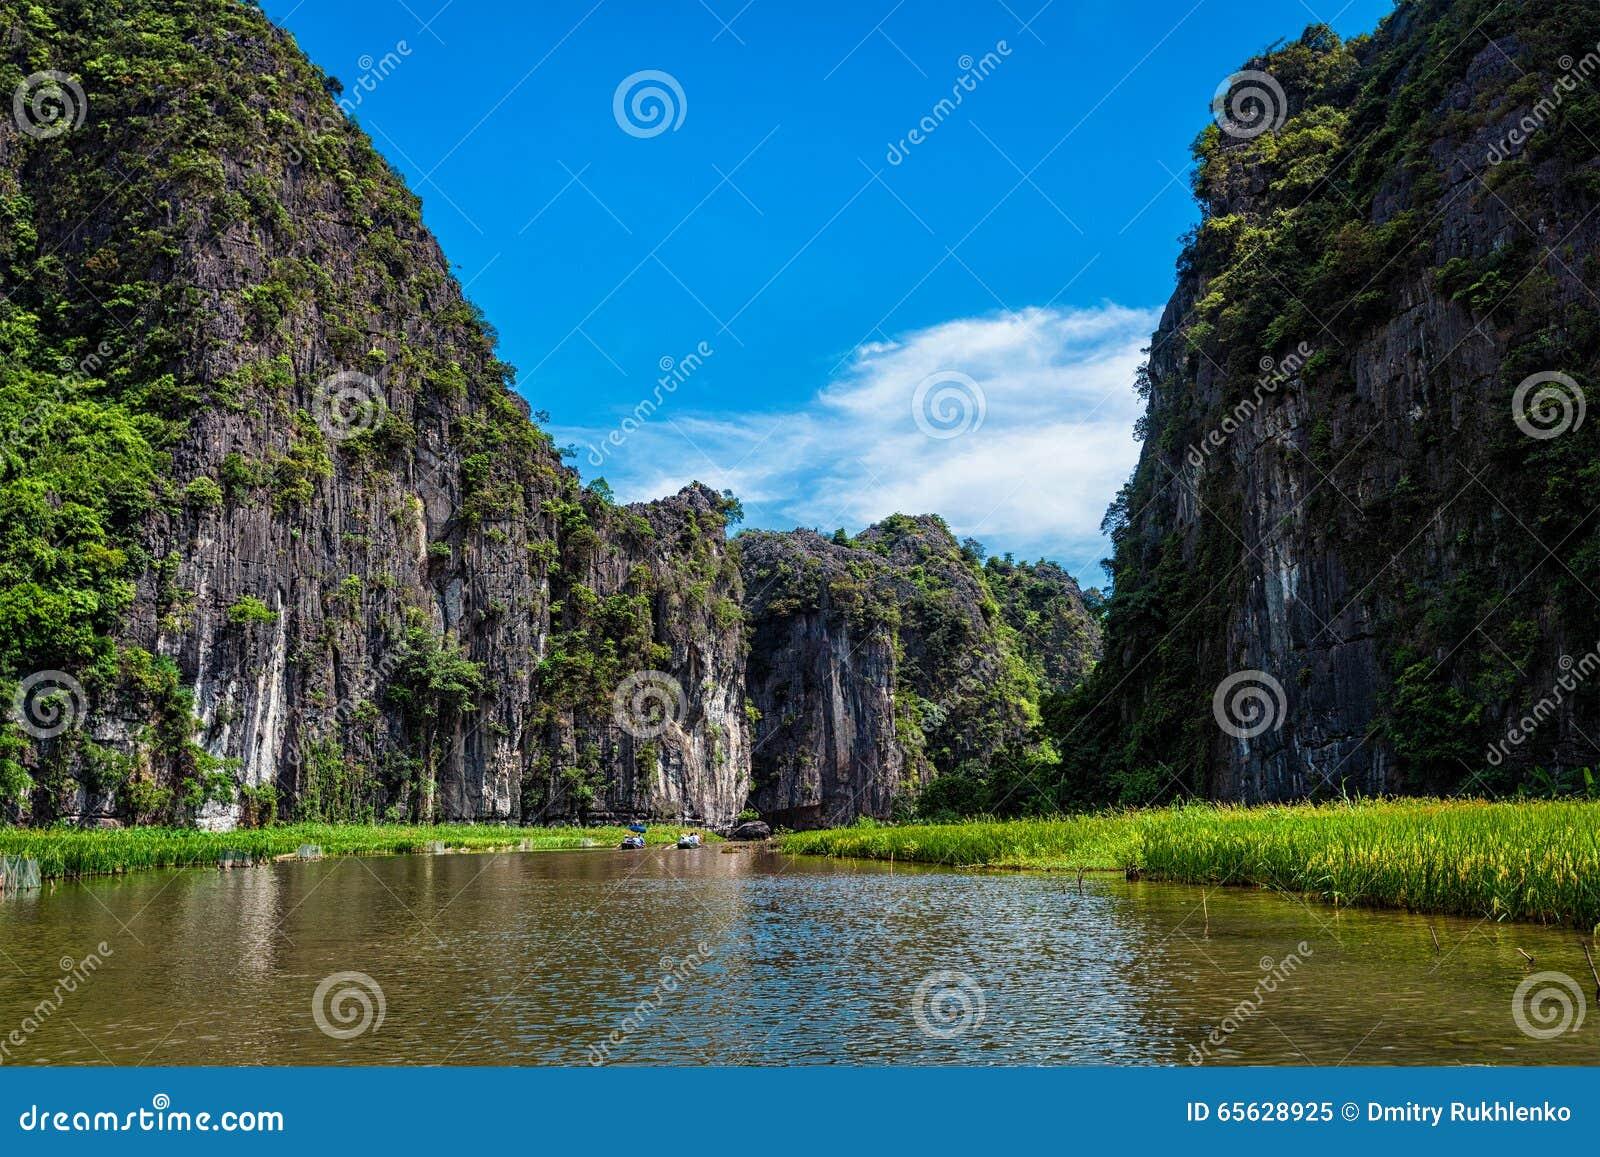 Destination de touristes de Tam Coc au Vietnam